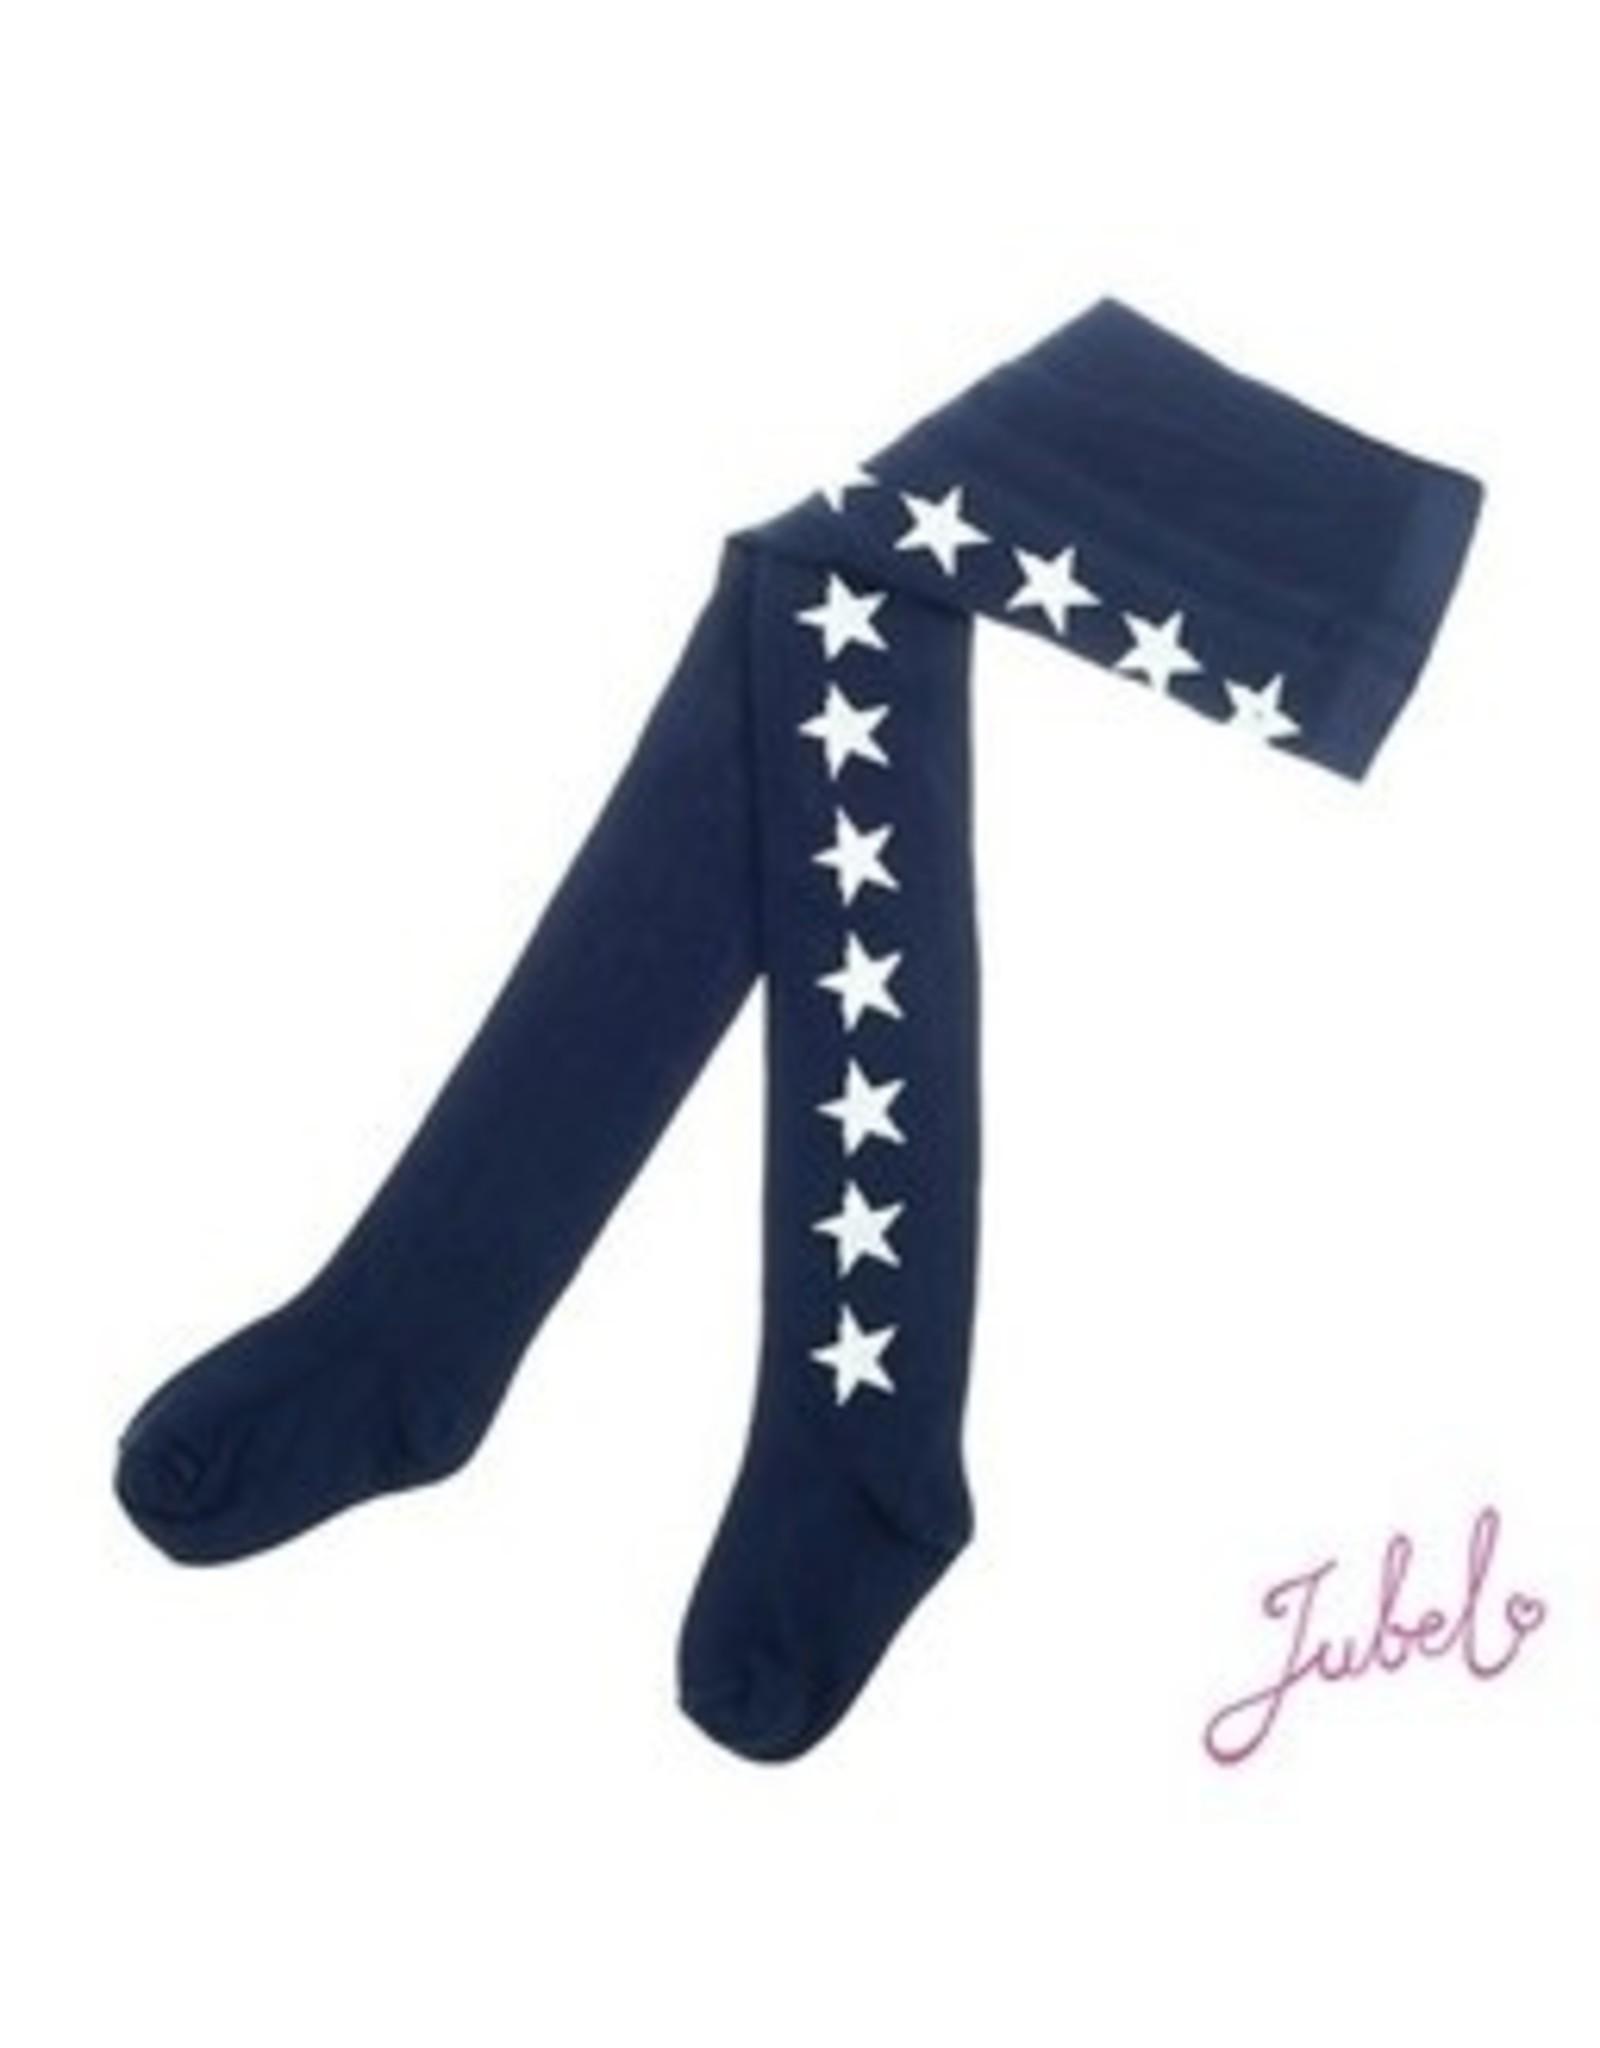 Jubel Maillot - Lucky Star maat 92